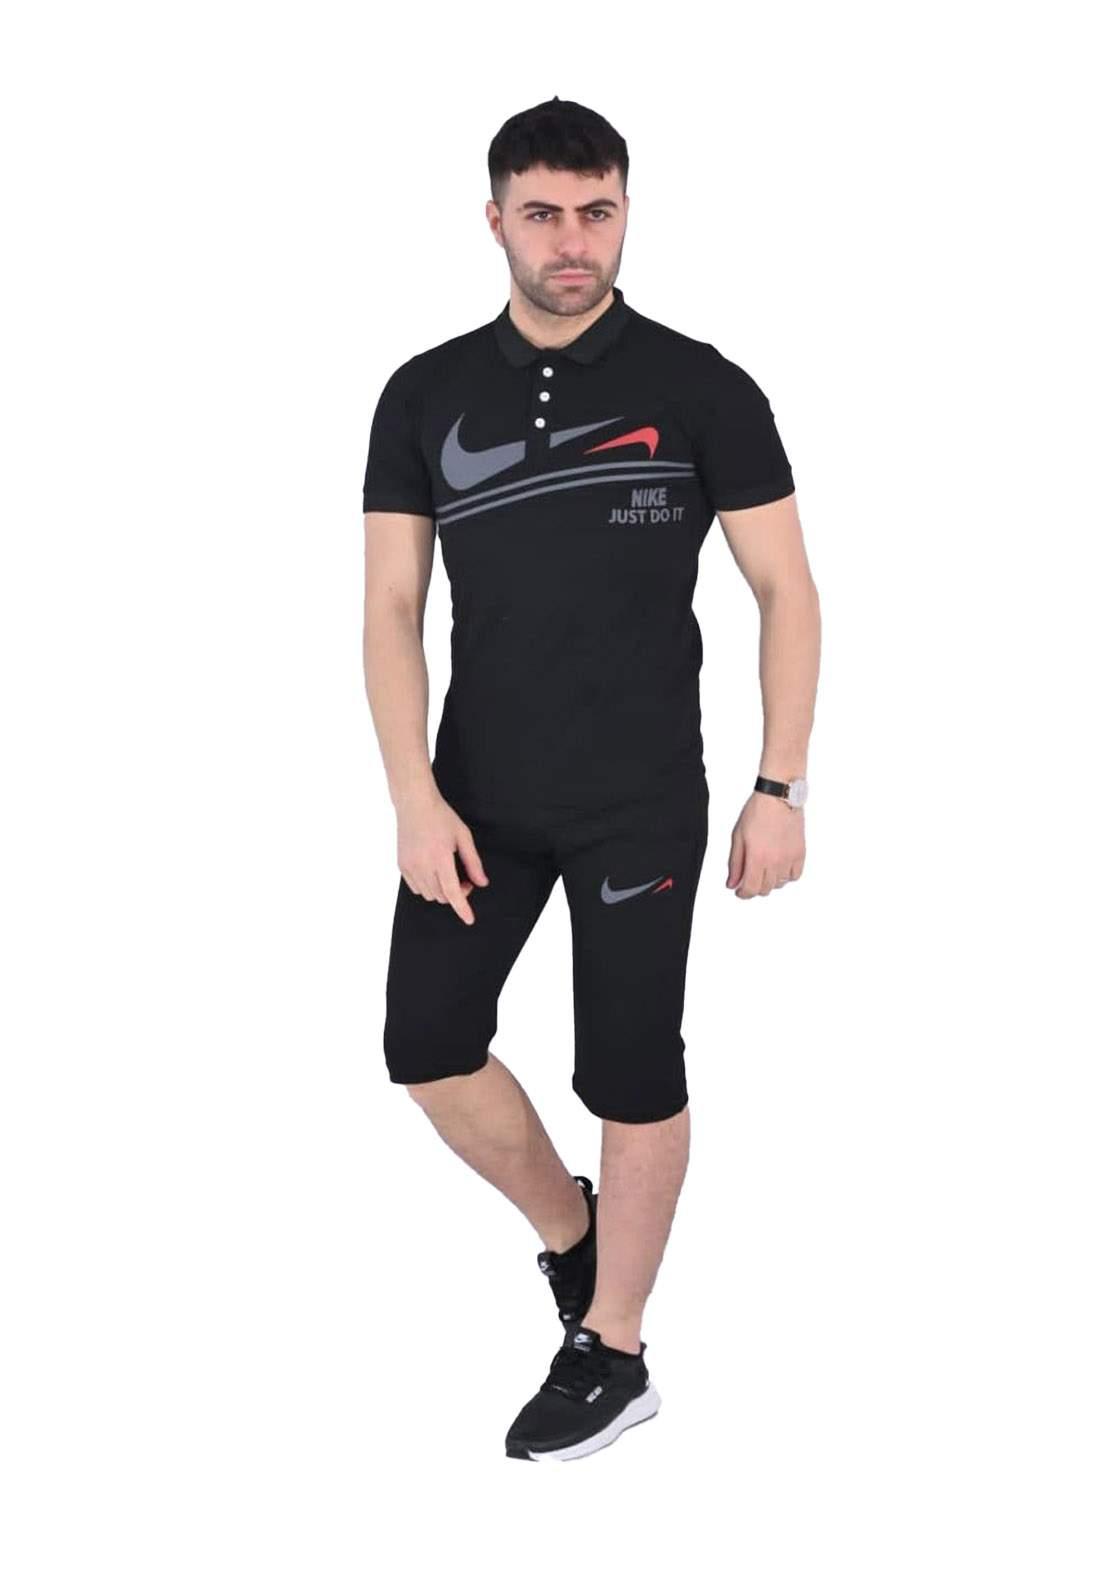 Nike Sportswear تراكسوت رجالي اسود اللون